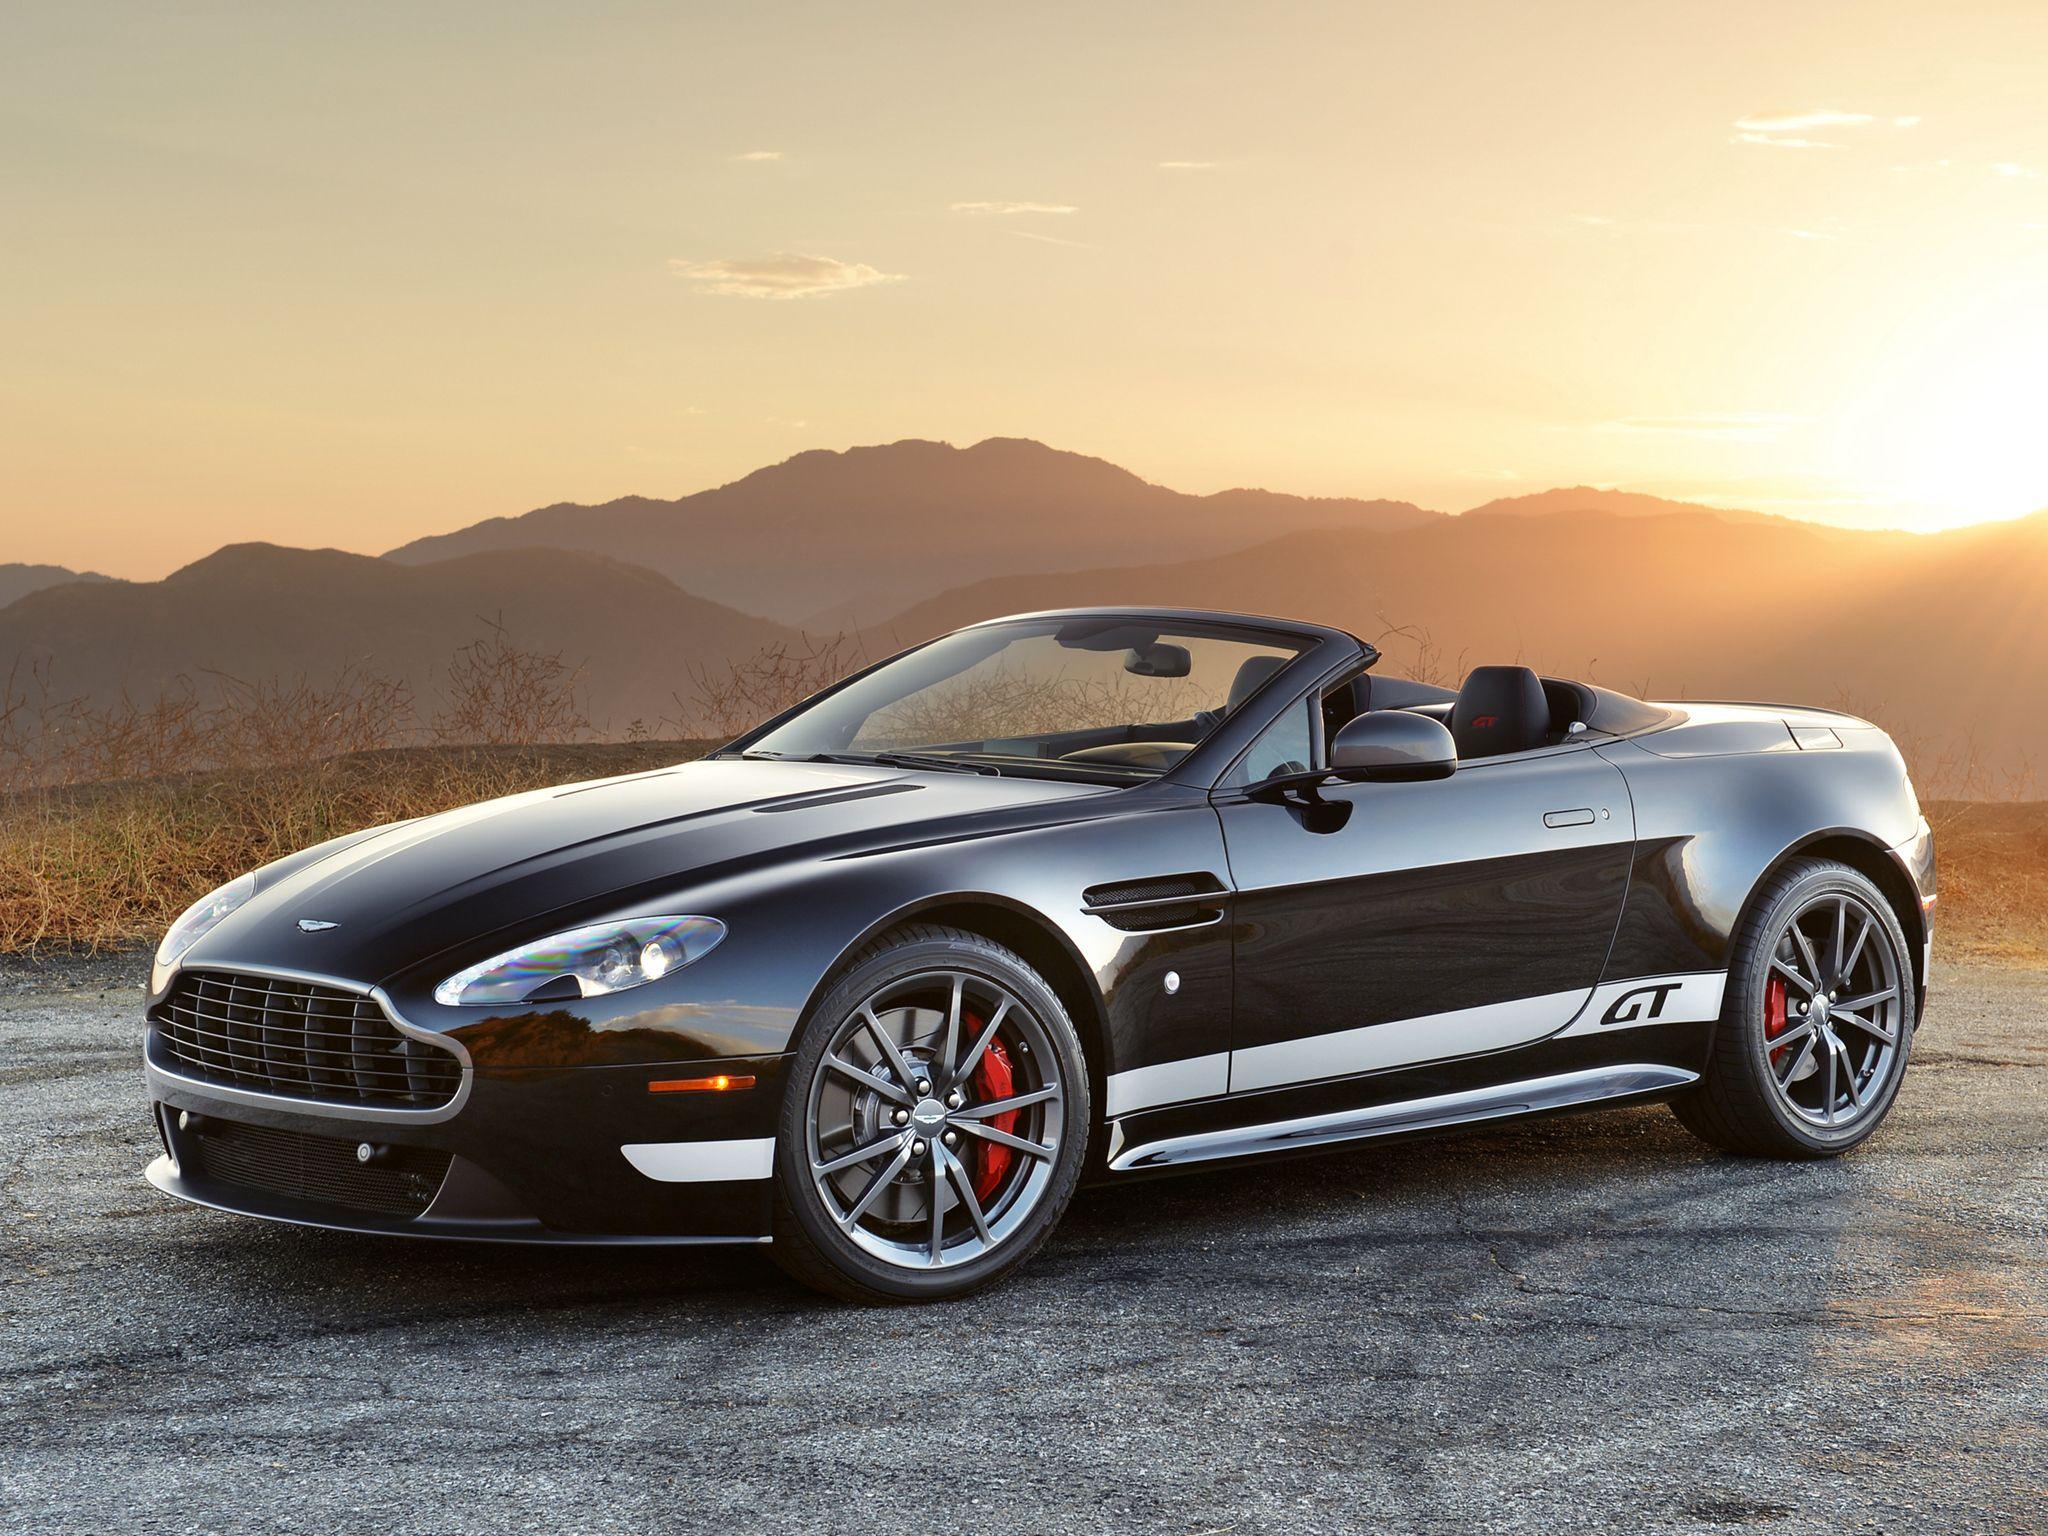 Aston Martin V8 Vantage Aston martin, Luxury cars, Cars